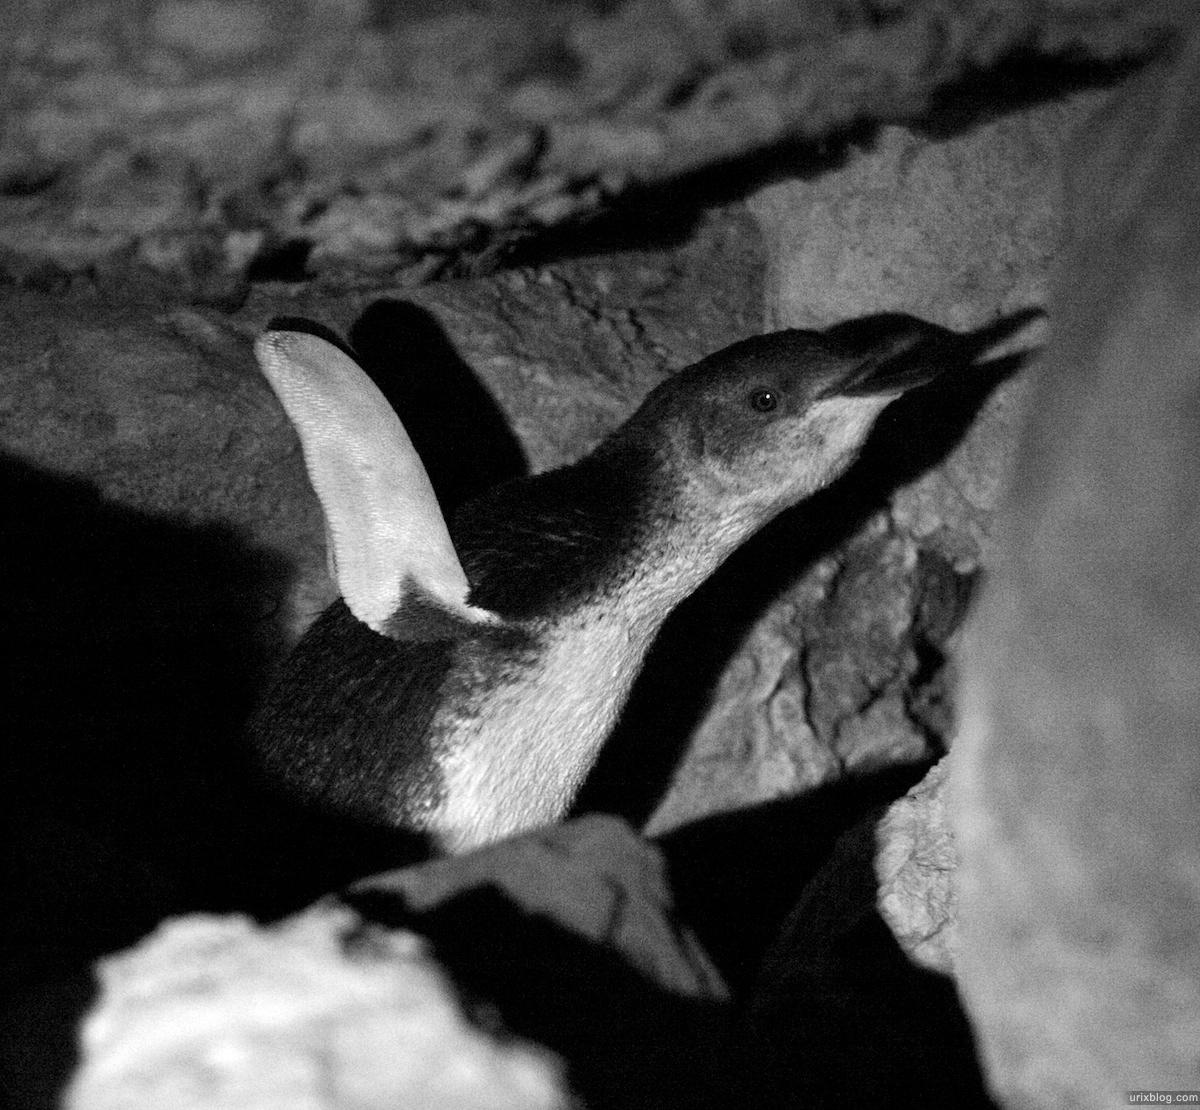 2011 South Australia, Kangaroo Island, Остров Кенгуру, Южная Австралия, Kingscote, penguin, пингвин